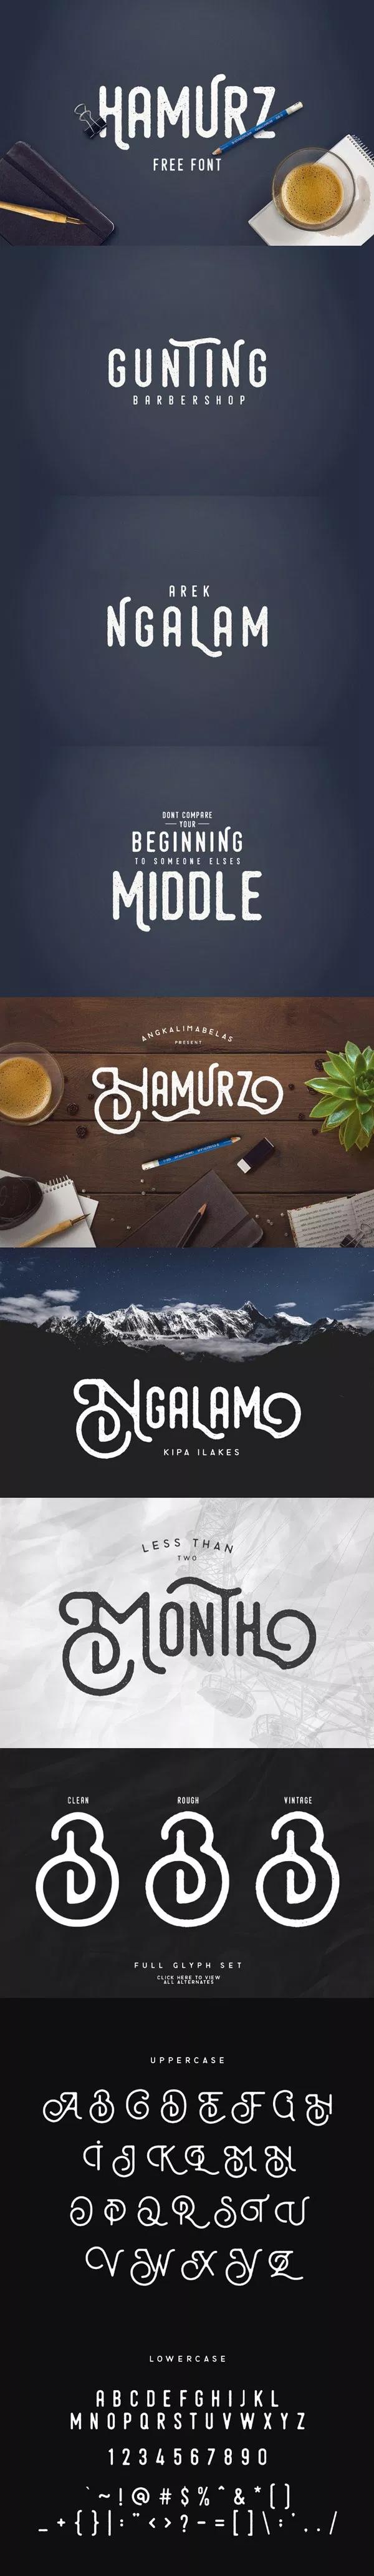 Hamurz Creative Free Font